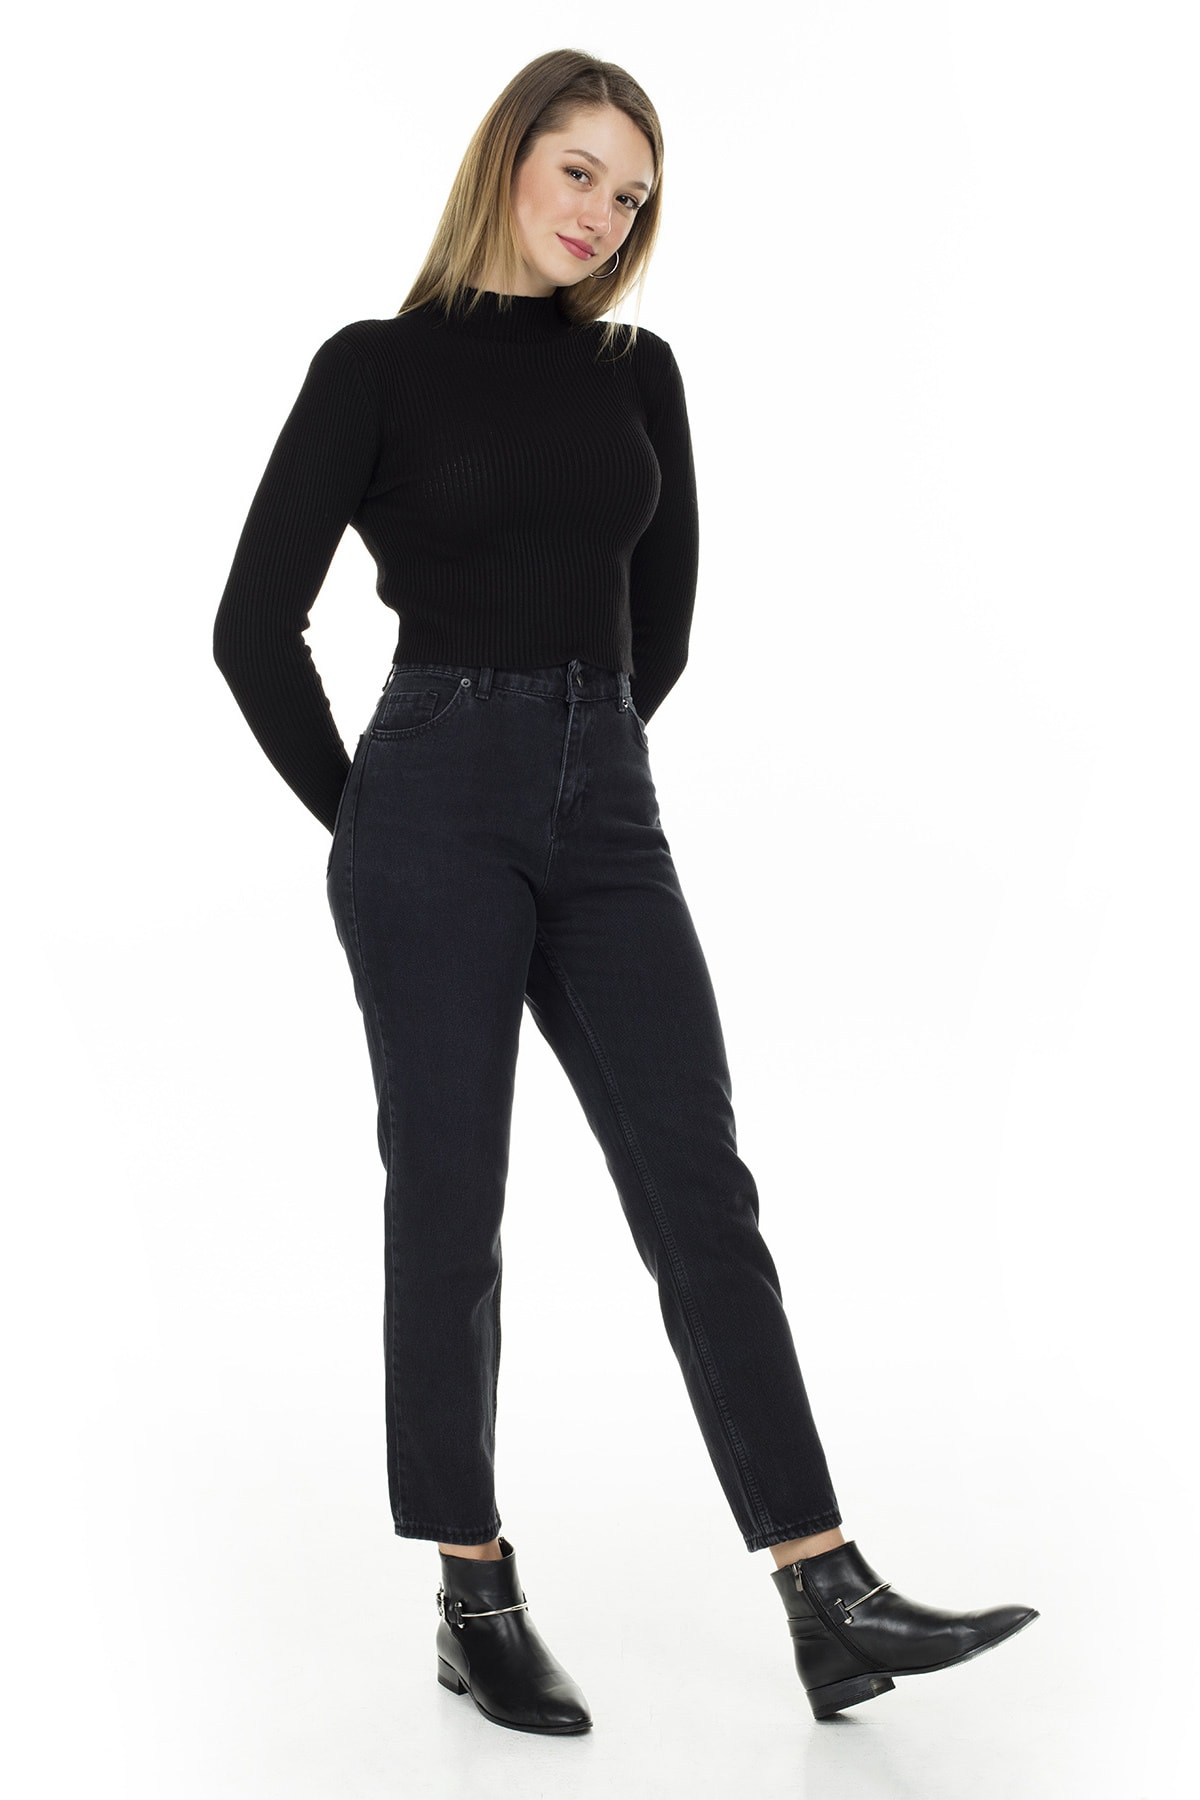 Lela Kadın Pamuklu Mom Jeans Kot Pantolon 5873041